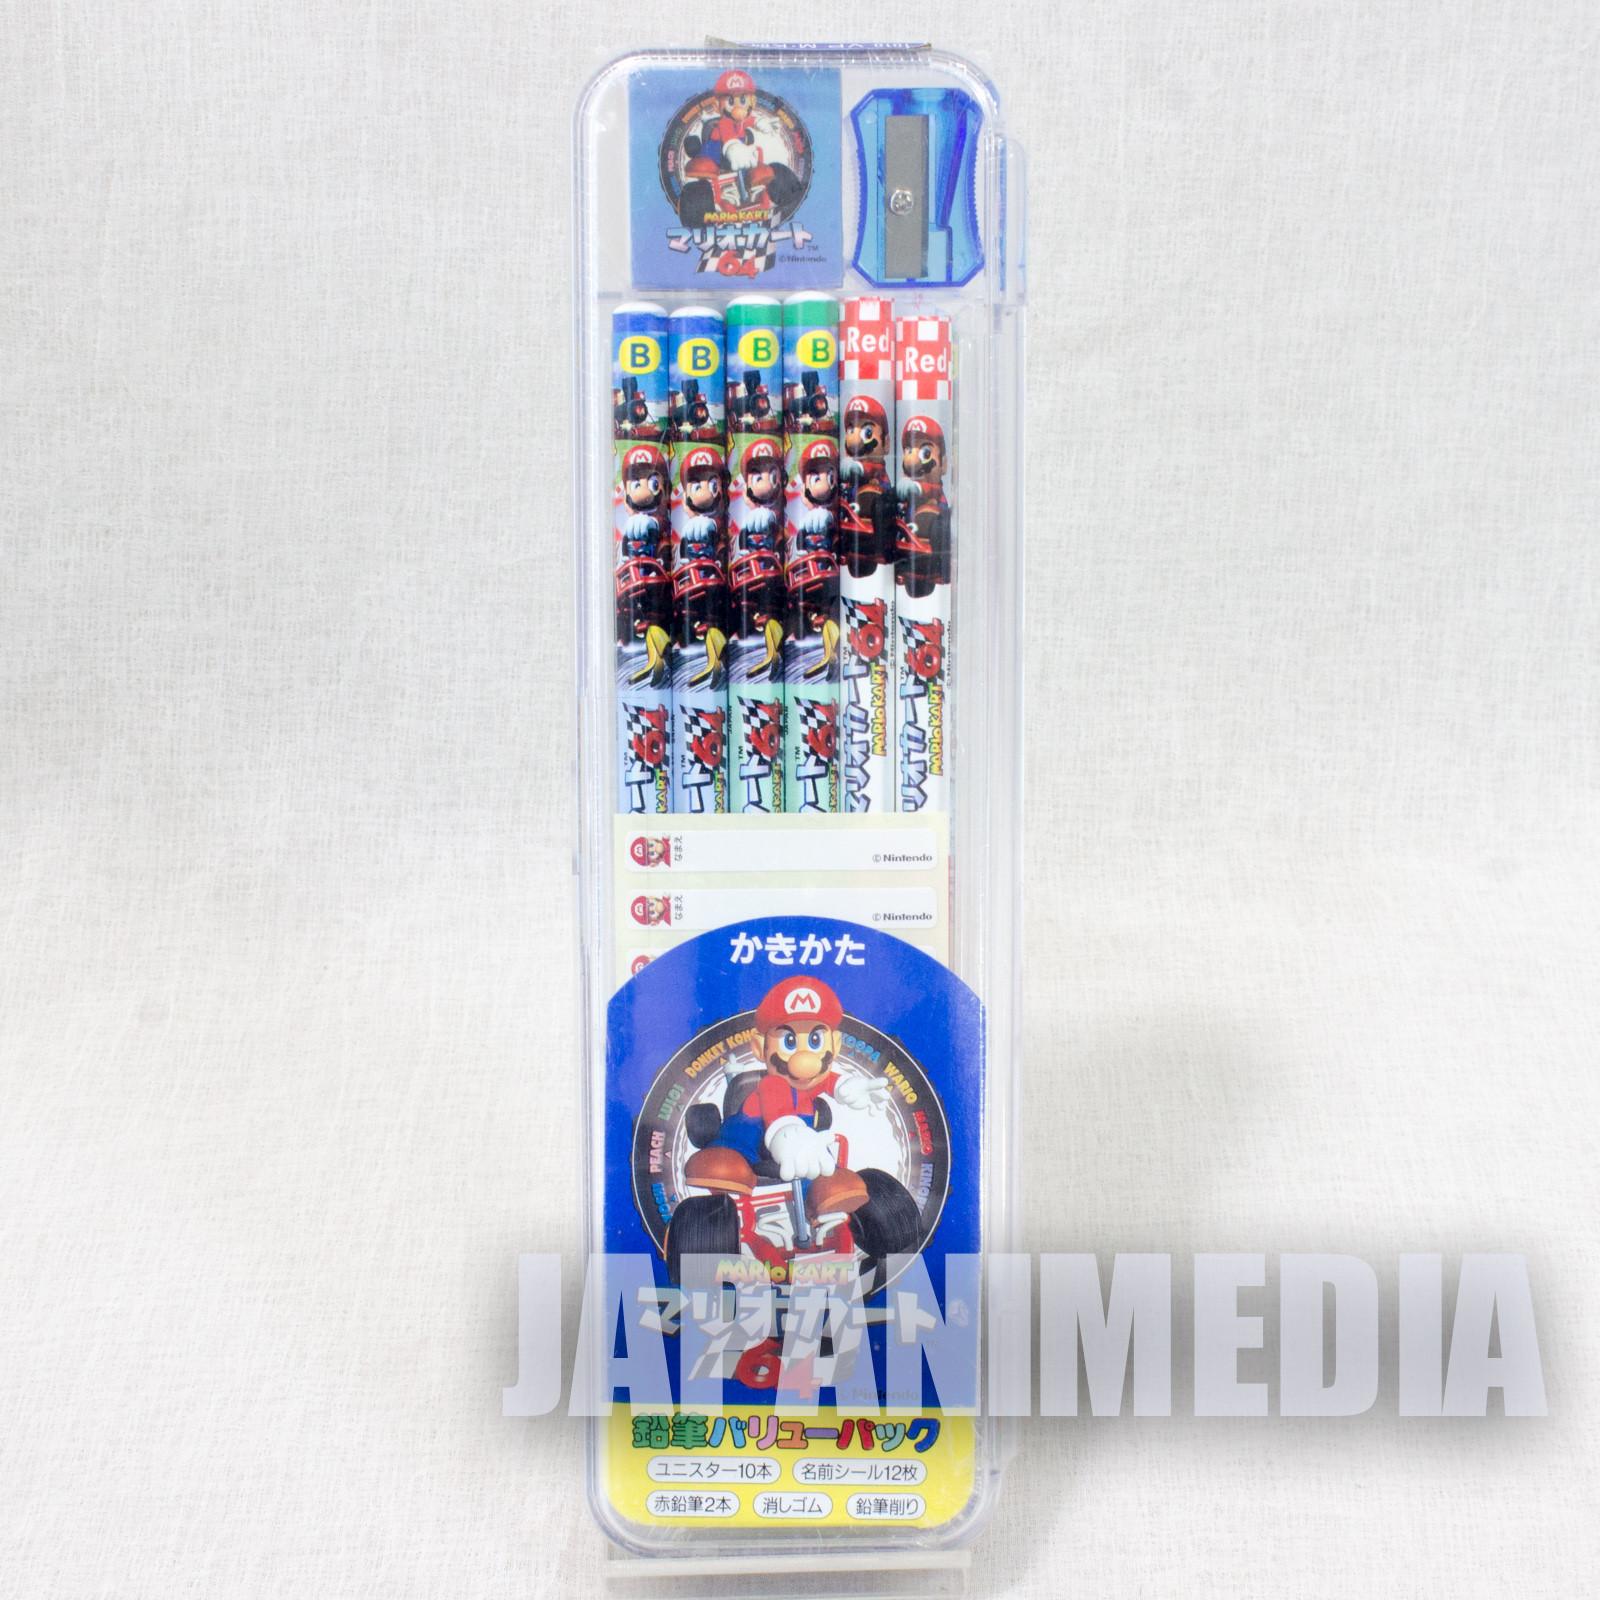 Retro Super Mario Kart 64 Pencli & Sharpener & Eraser Set JAPAN NINTENDO